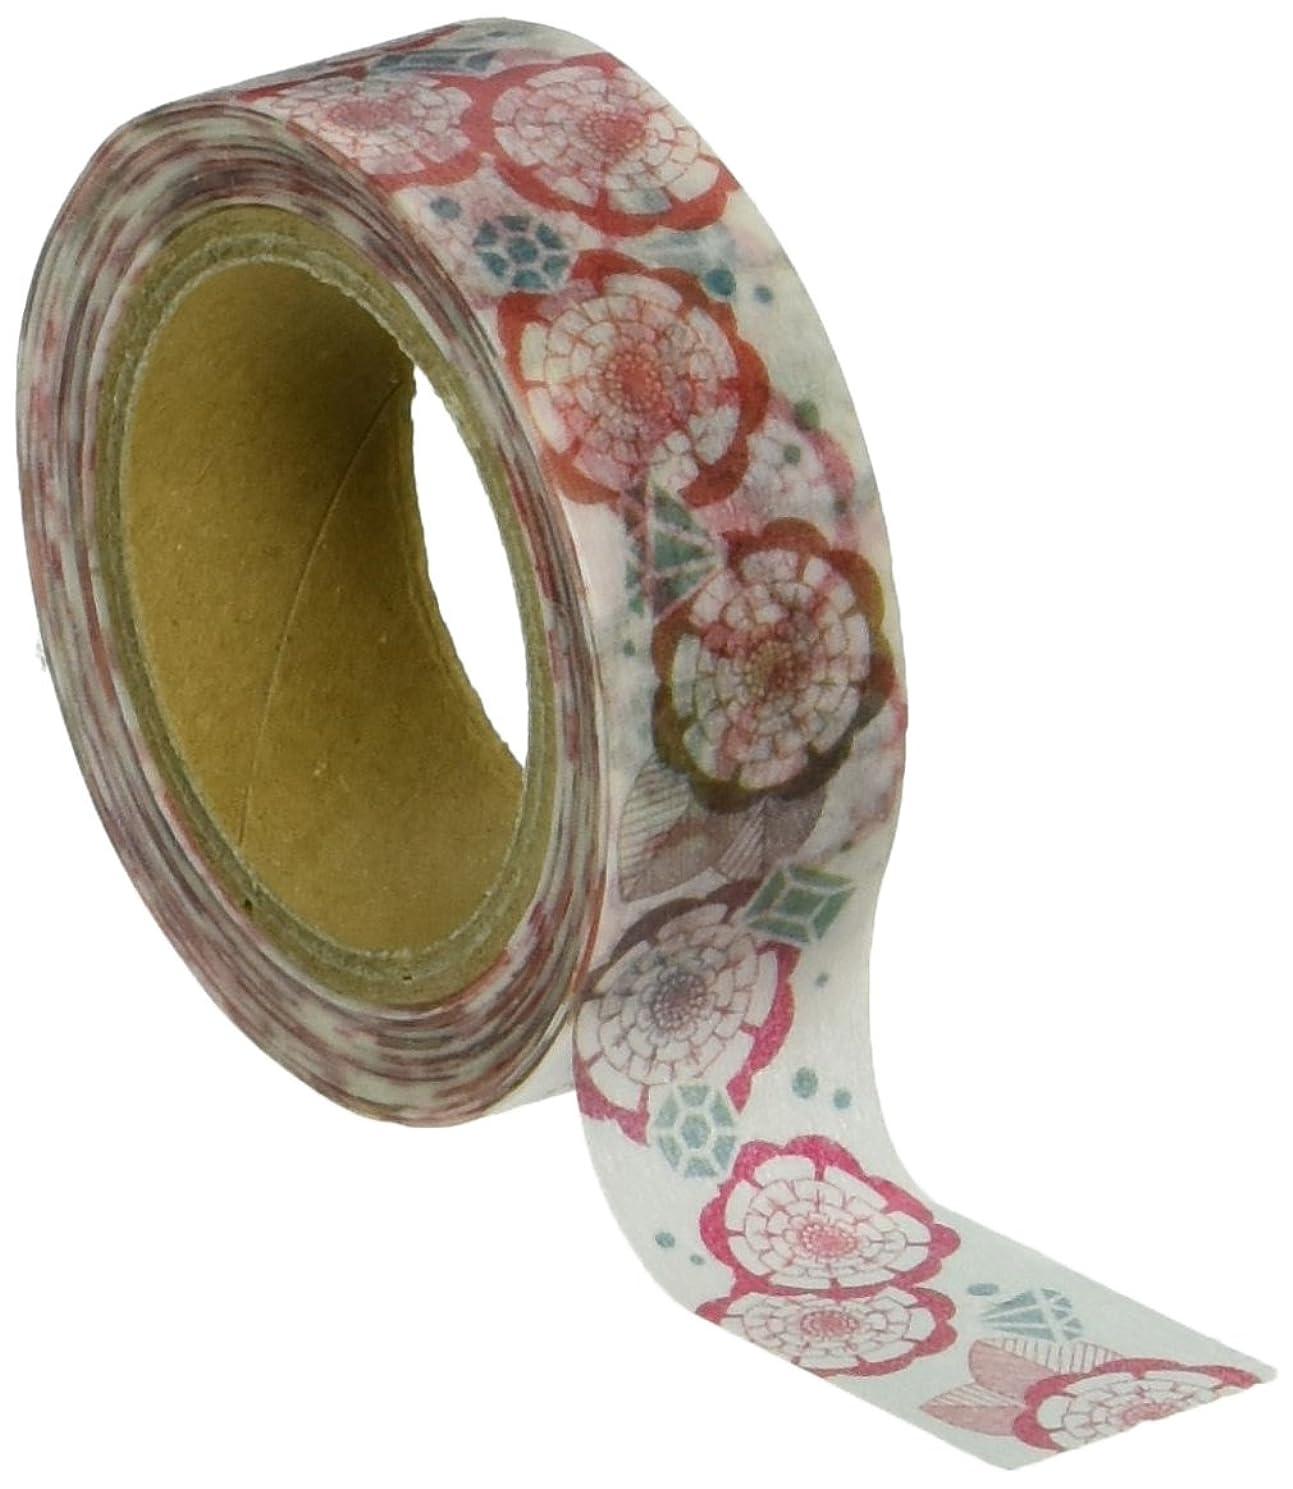 Roundtop Designer's Washi Masking Tape 20mm x 10m, Azzurro Mattina, Flower & Gems (YS-MK-004)